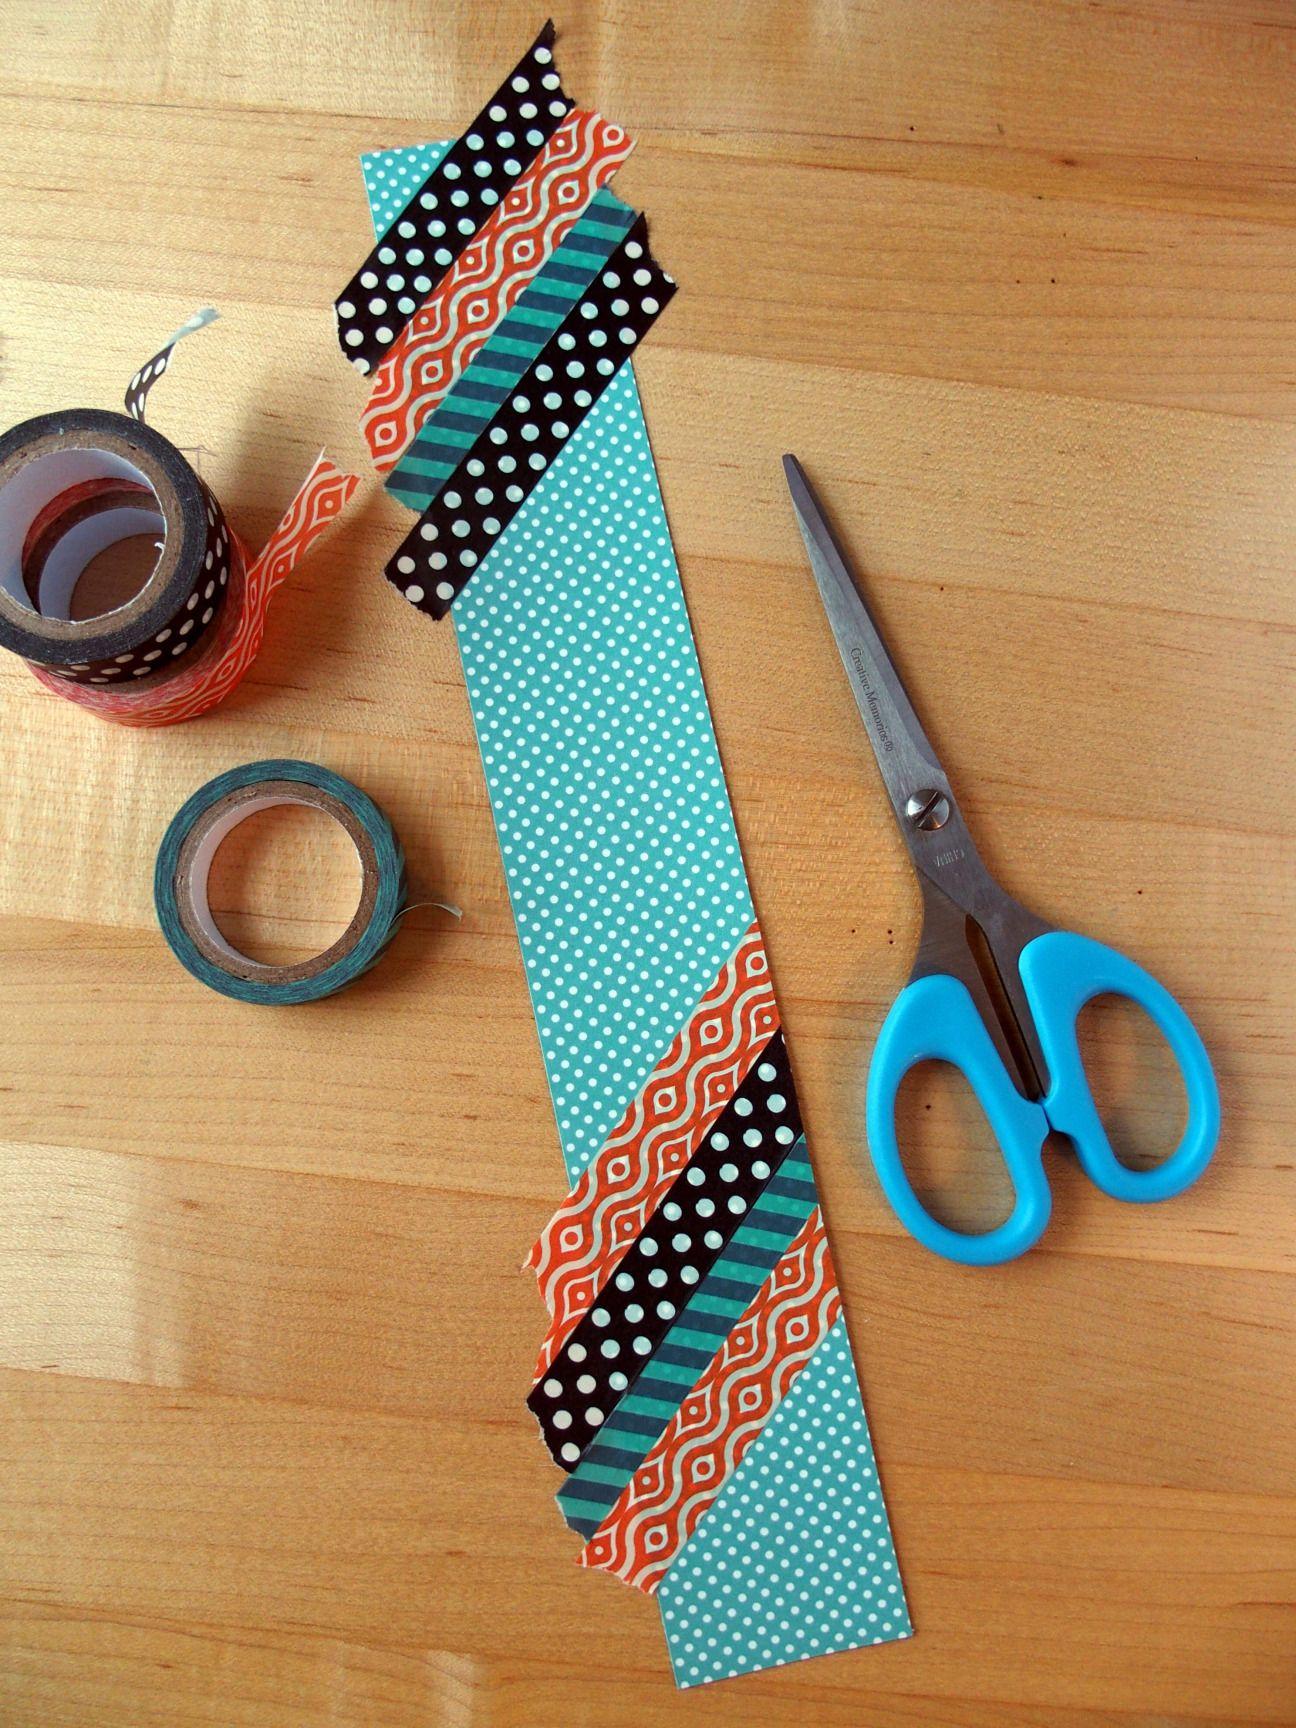 P9221592 Washi Tape Pinterest Scrapbooking Washi Tape And Washi